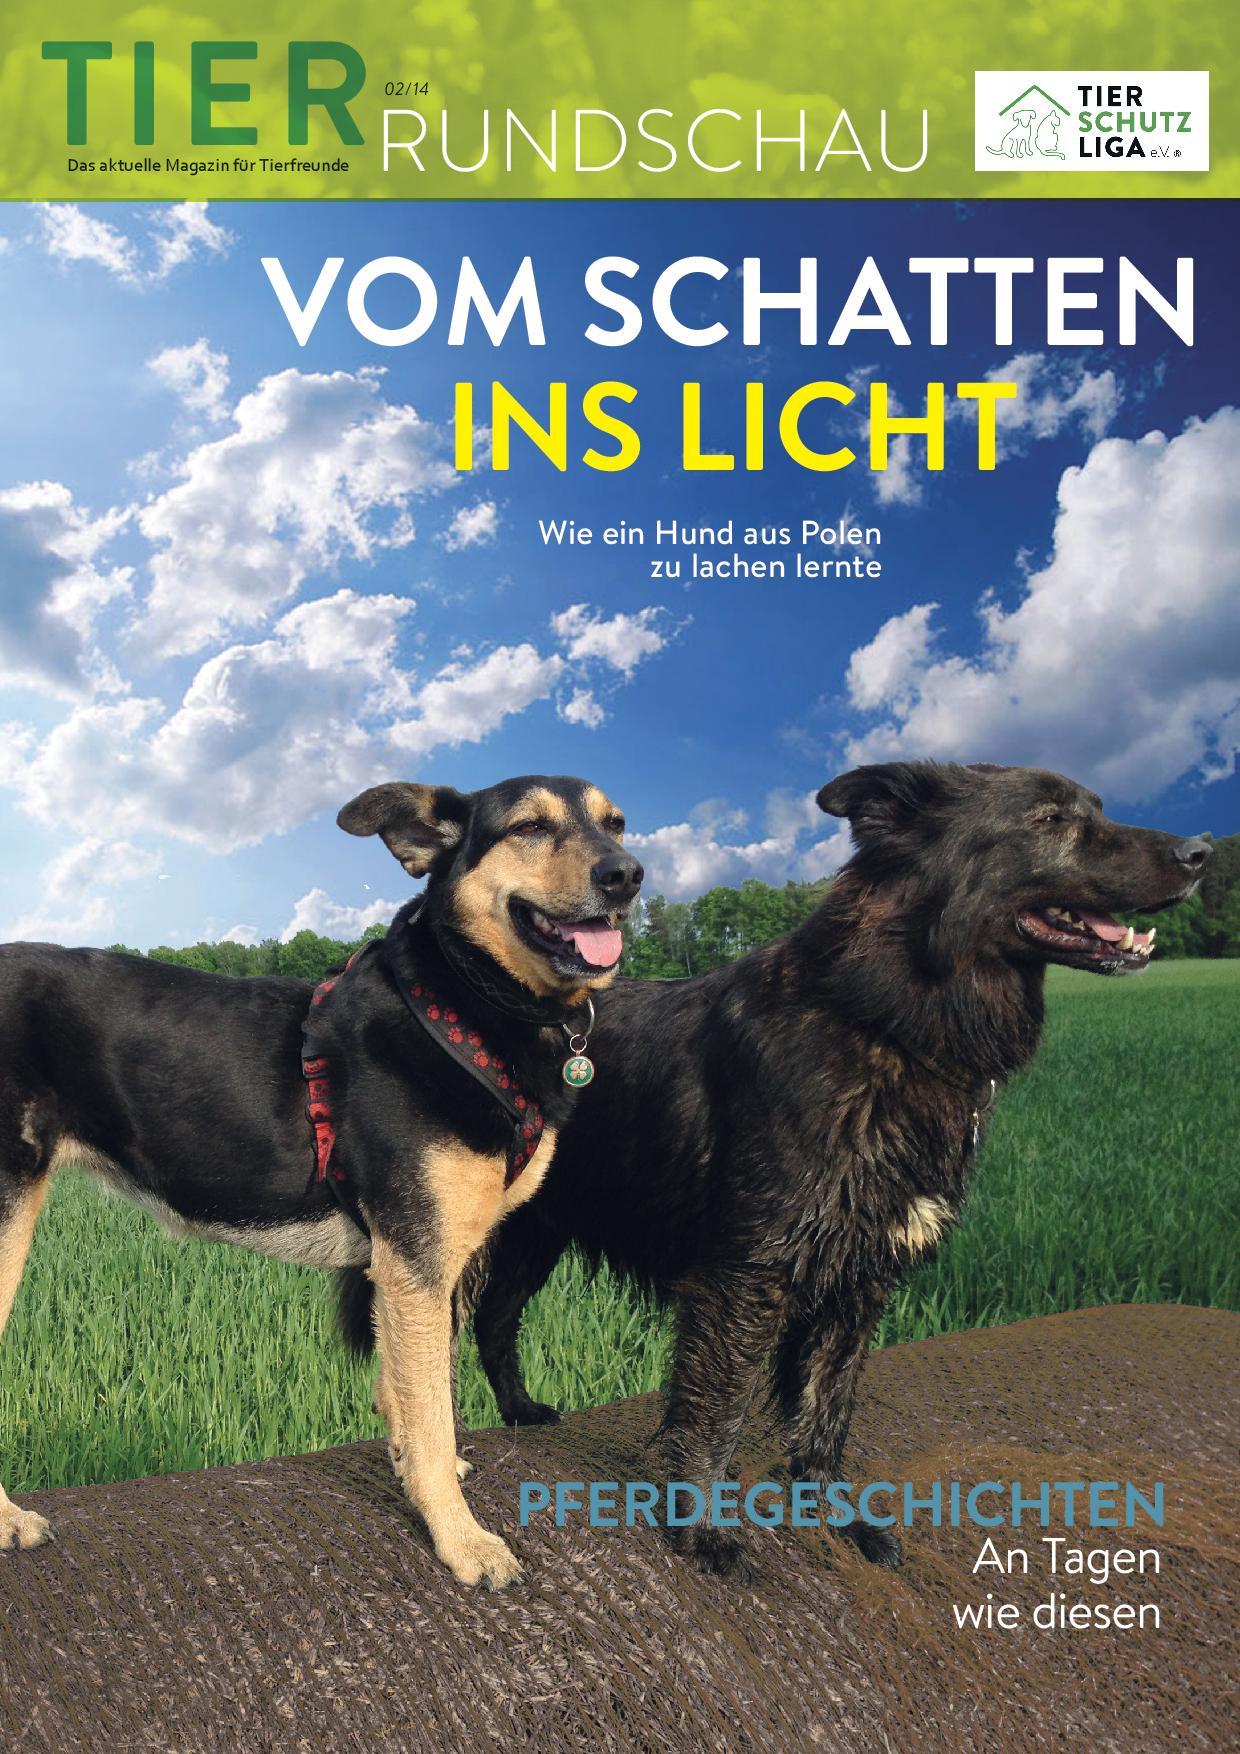 Tierrundschau-1402 Tierrundschau - aktuelles Tiermagazin